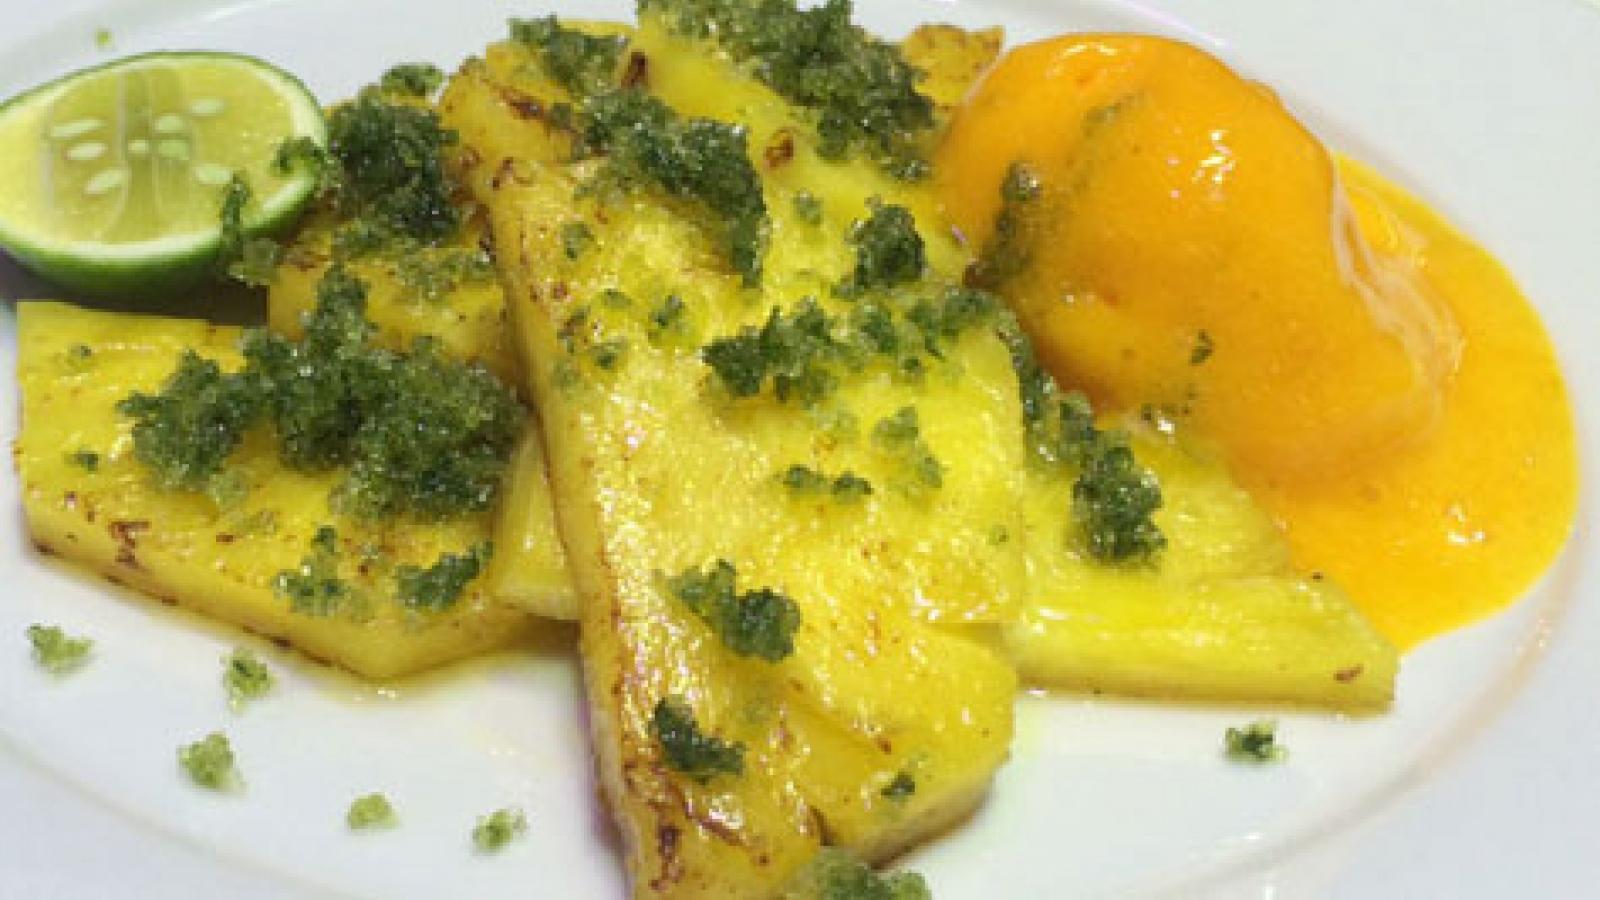 MasterChef New Zealand winner shows off cooking skills in Hanoi